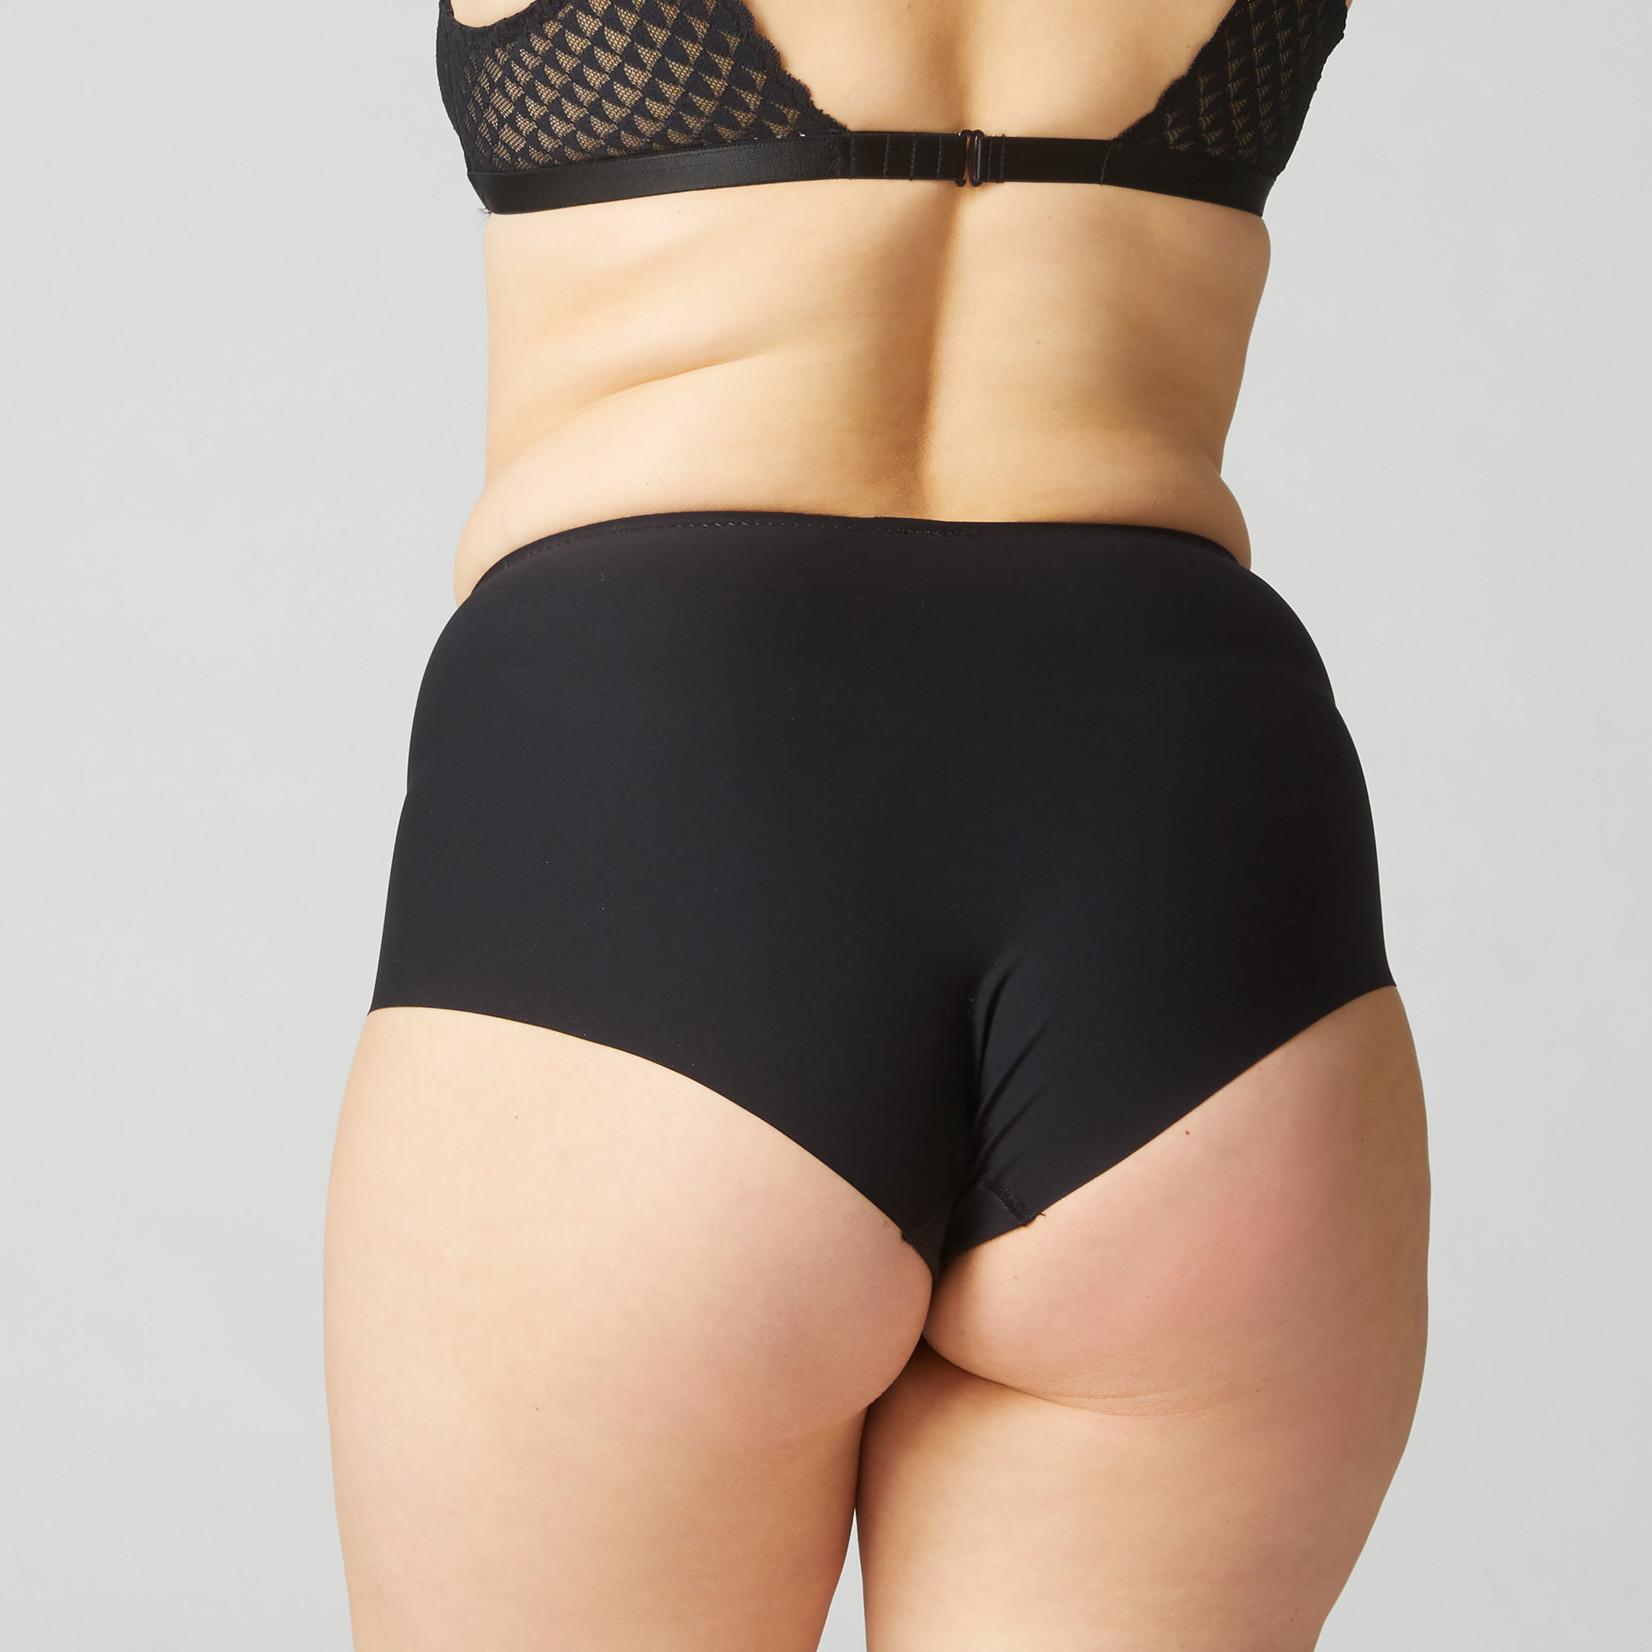 Simone Perele Simone Perele Subtile Control Panty